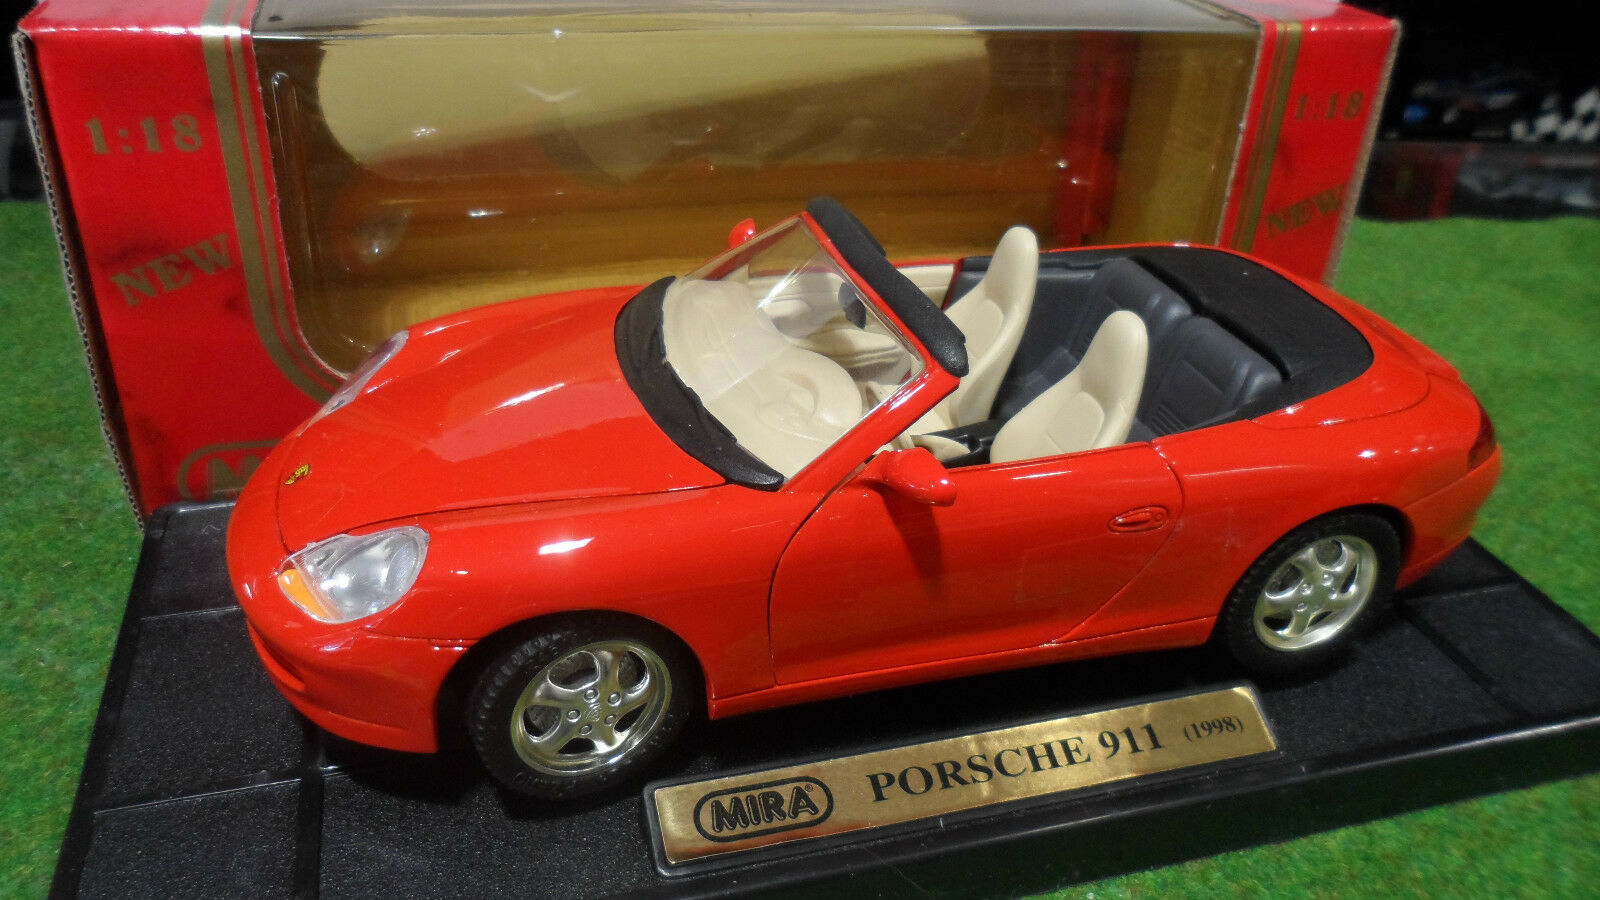 PORSCHE 911 996 Carrera Cabriolet 1998 Rouge 1 18 MIRA 06930 voiture miniature